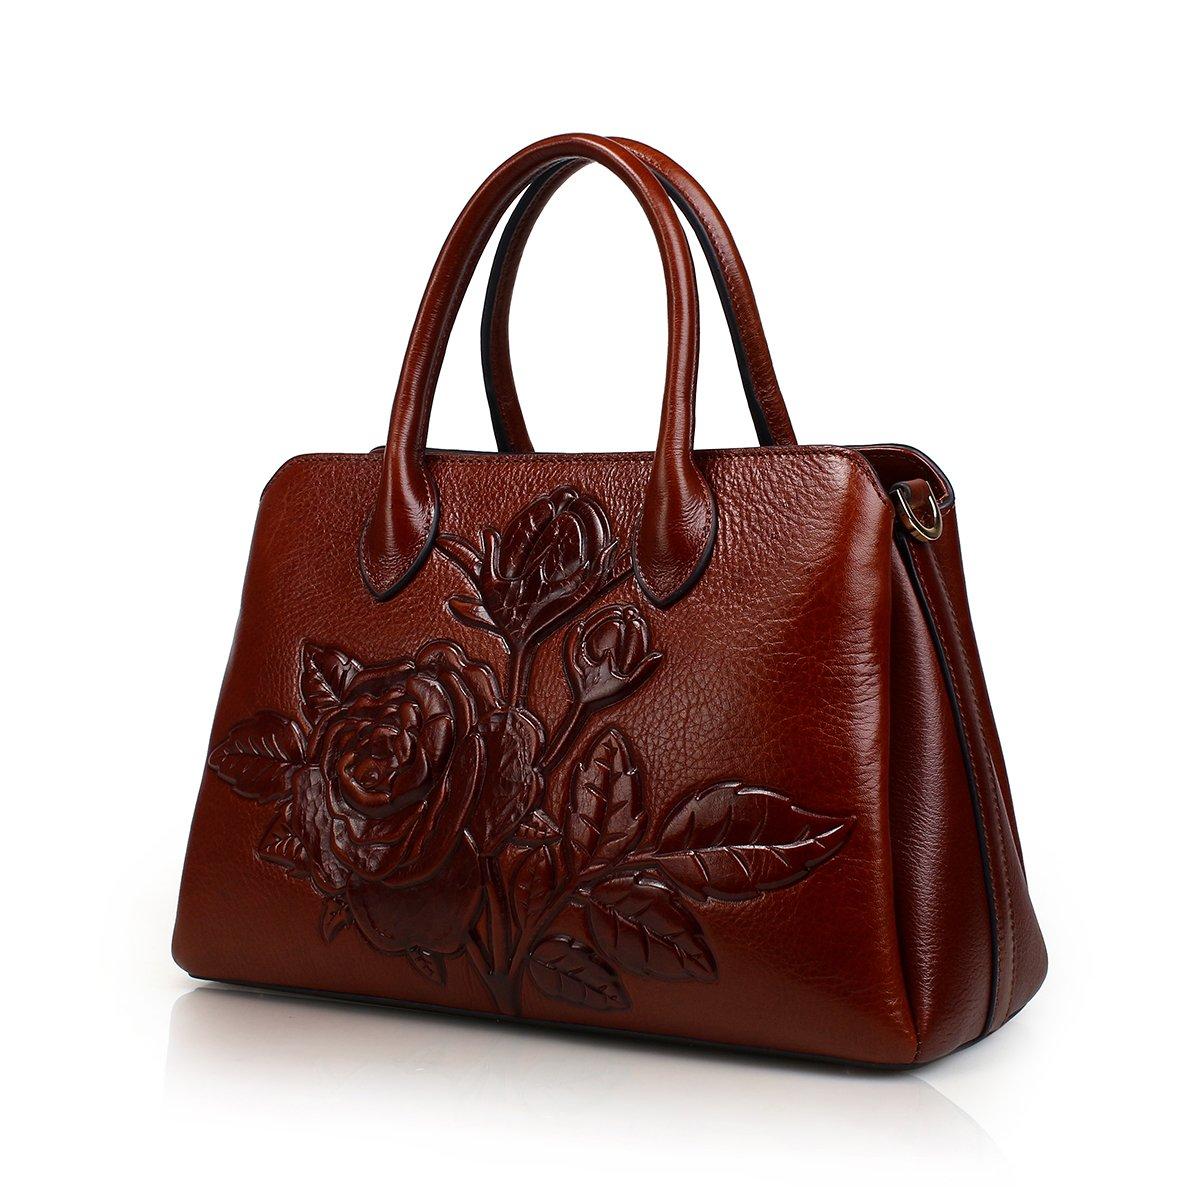 APHISON Designer Unique Embossed Floral Cowhide Leather Tote Style Ladies Top Handle Bag Handbag (Brown)